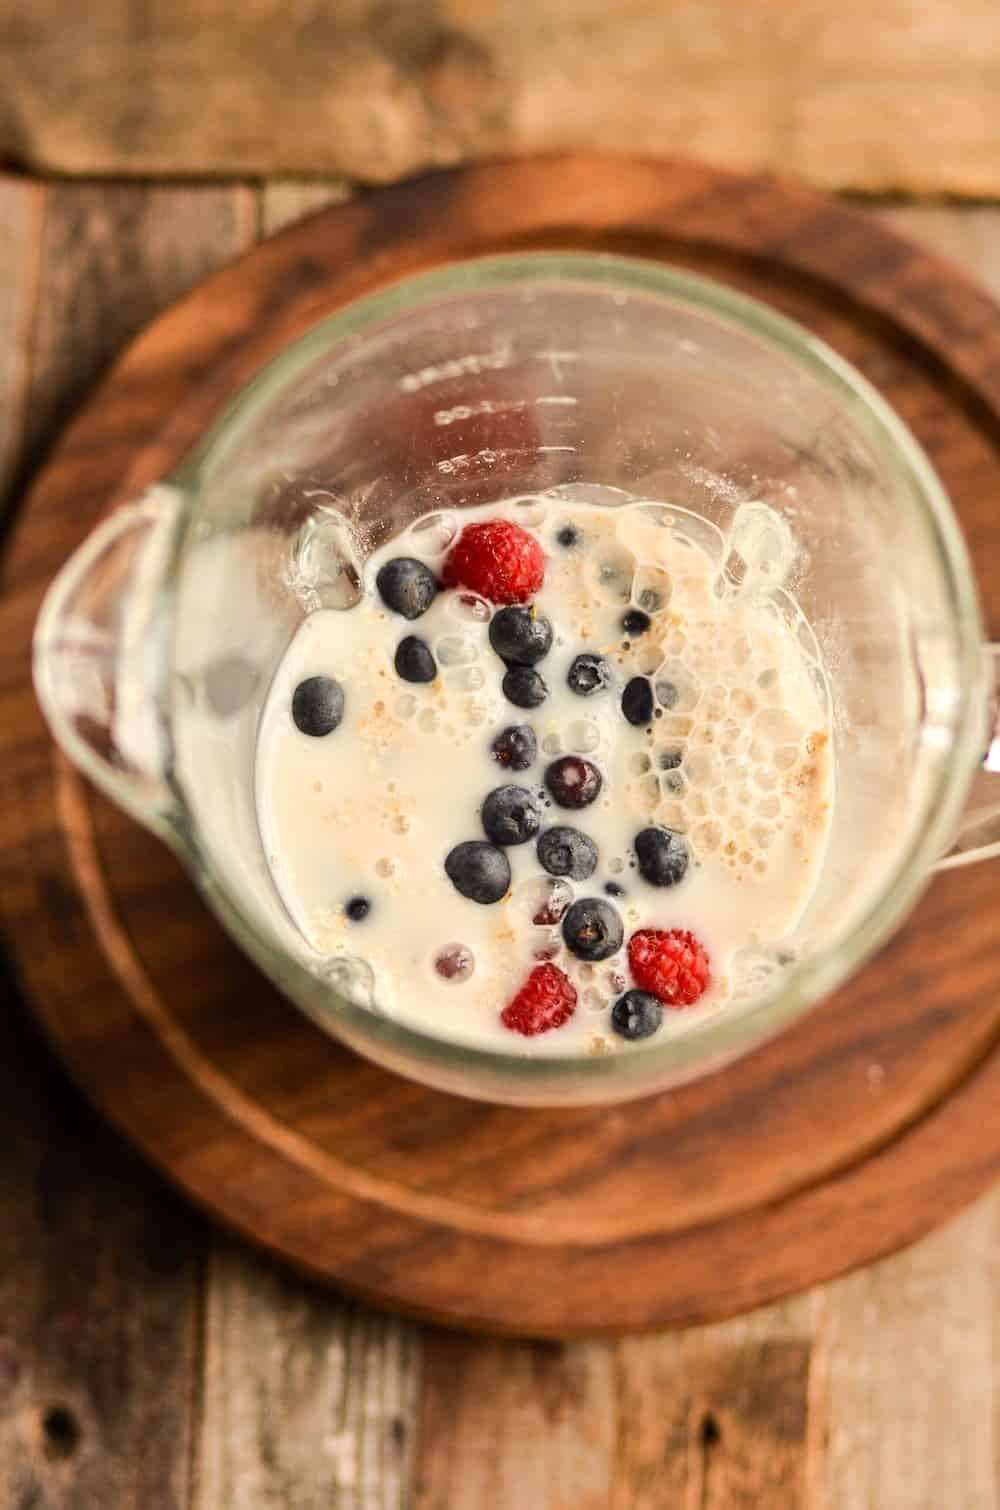 Oatmeal yogurt smoothie in a blender